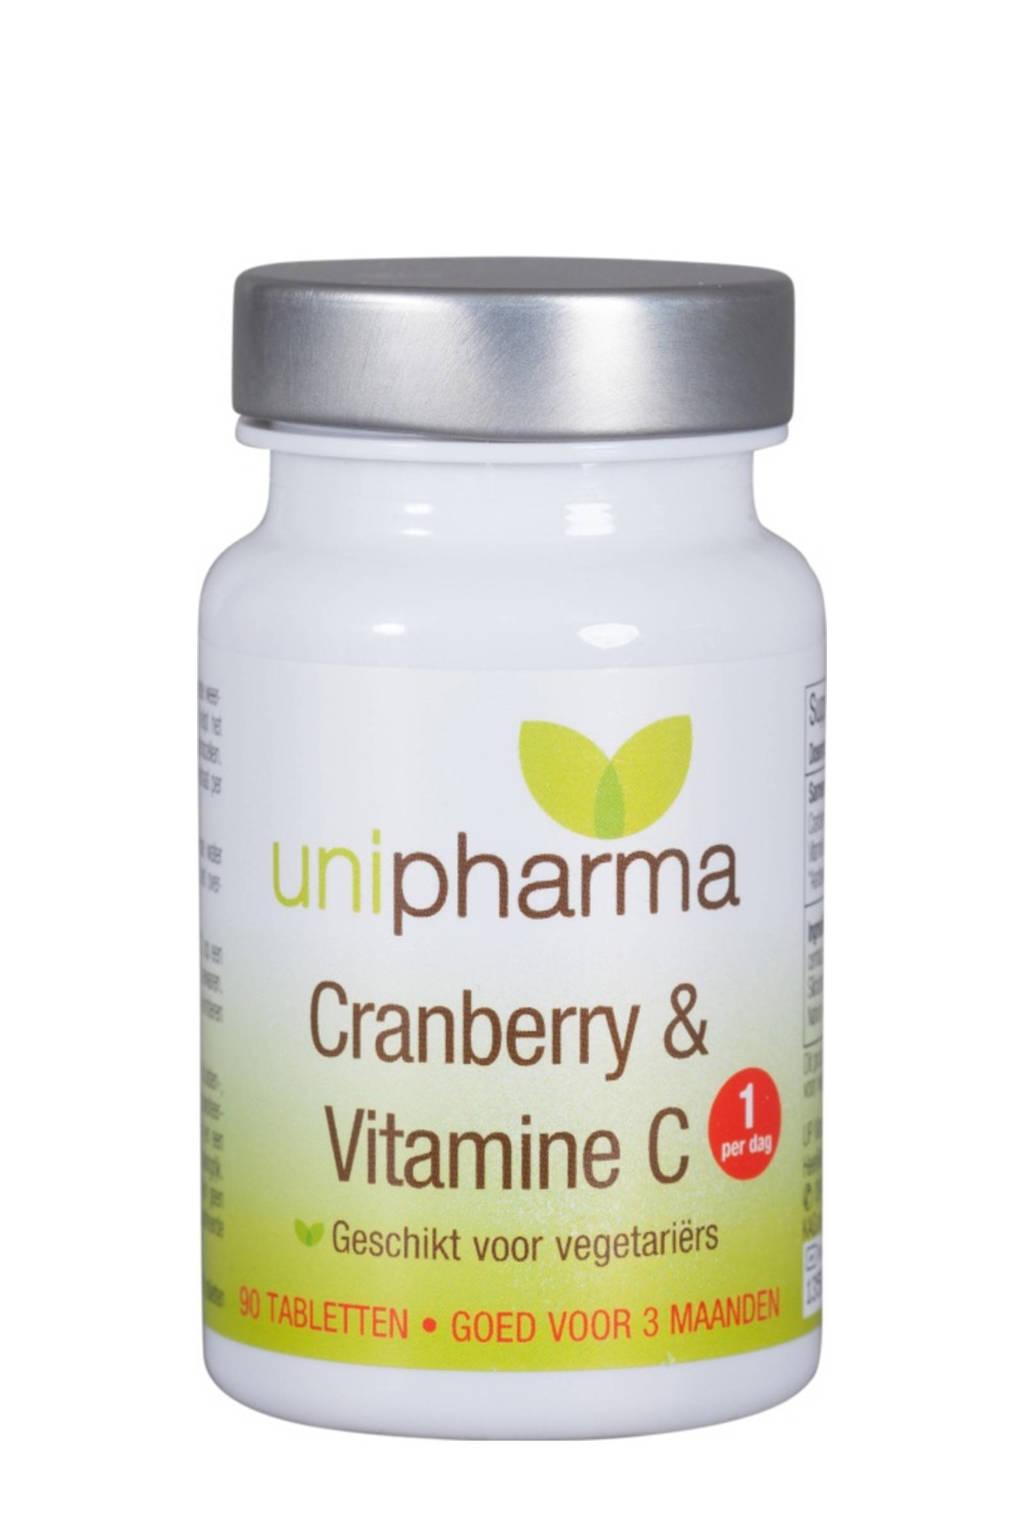 Unipharma Cranberry & Vitamine C - 90 tabletten